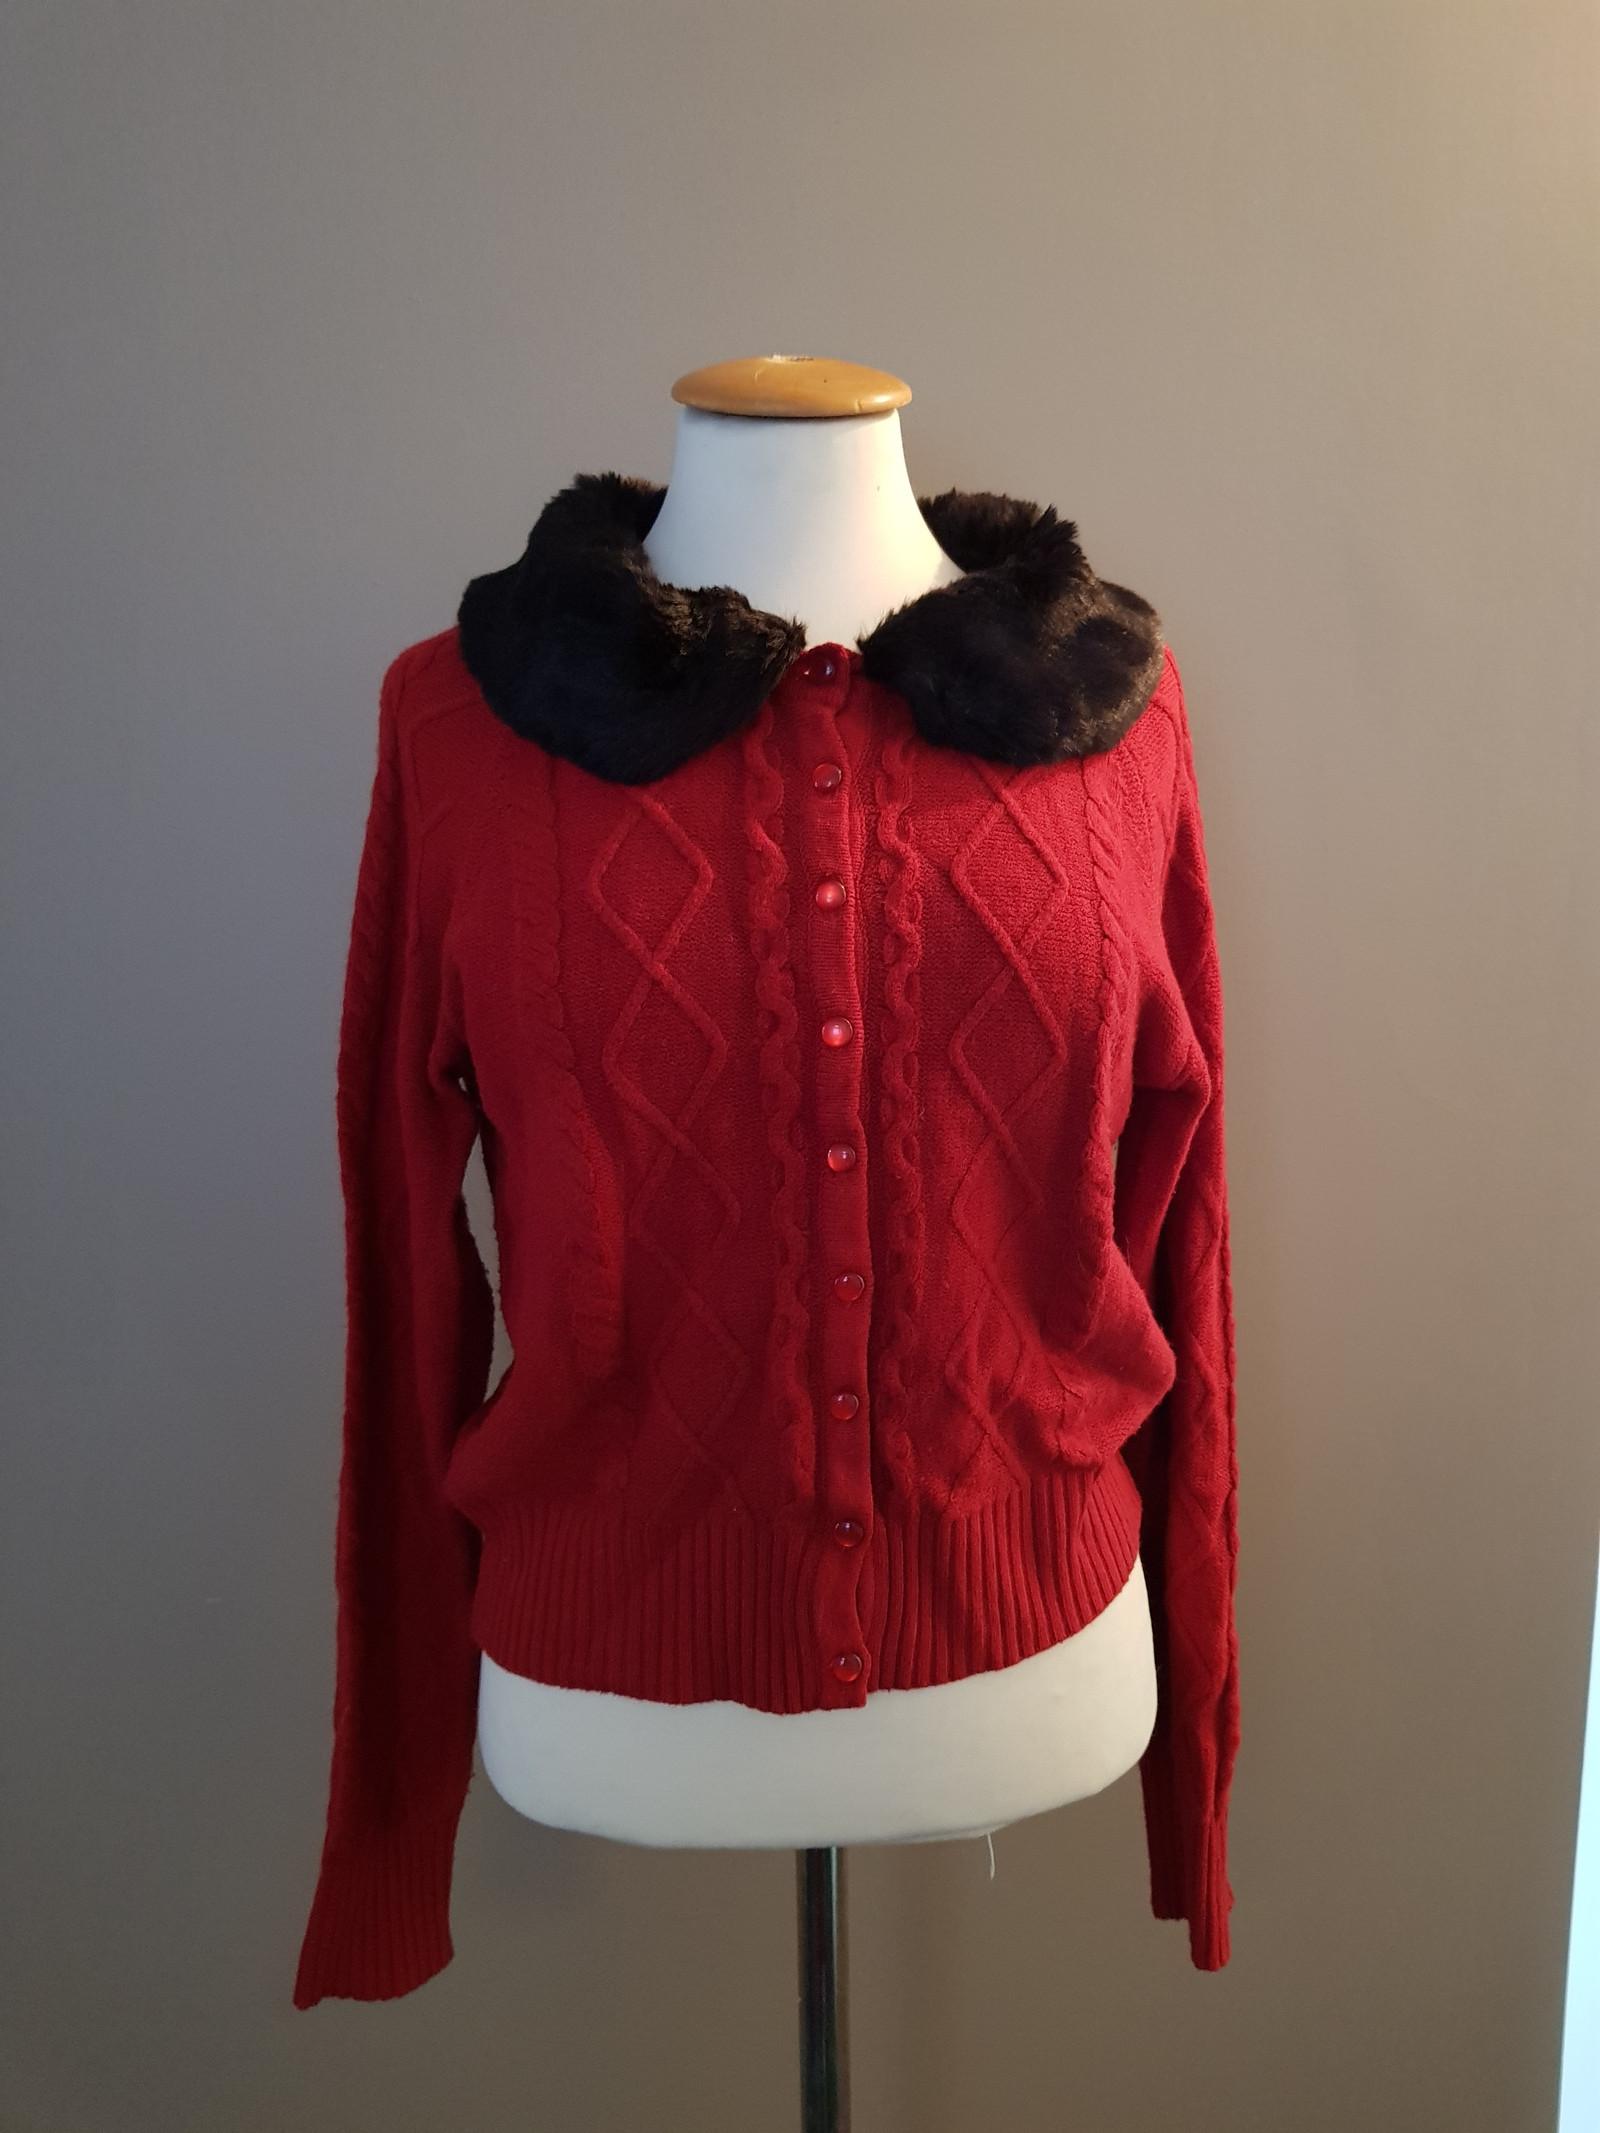 3f76c82c Ny pris! Cardigan rød strikket pels M 38. 50 tallet stil | FINN.no